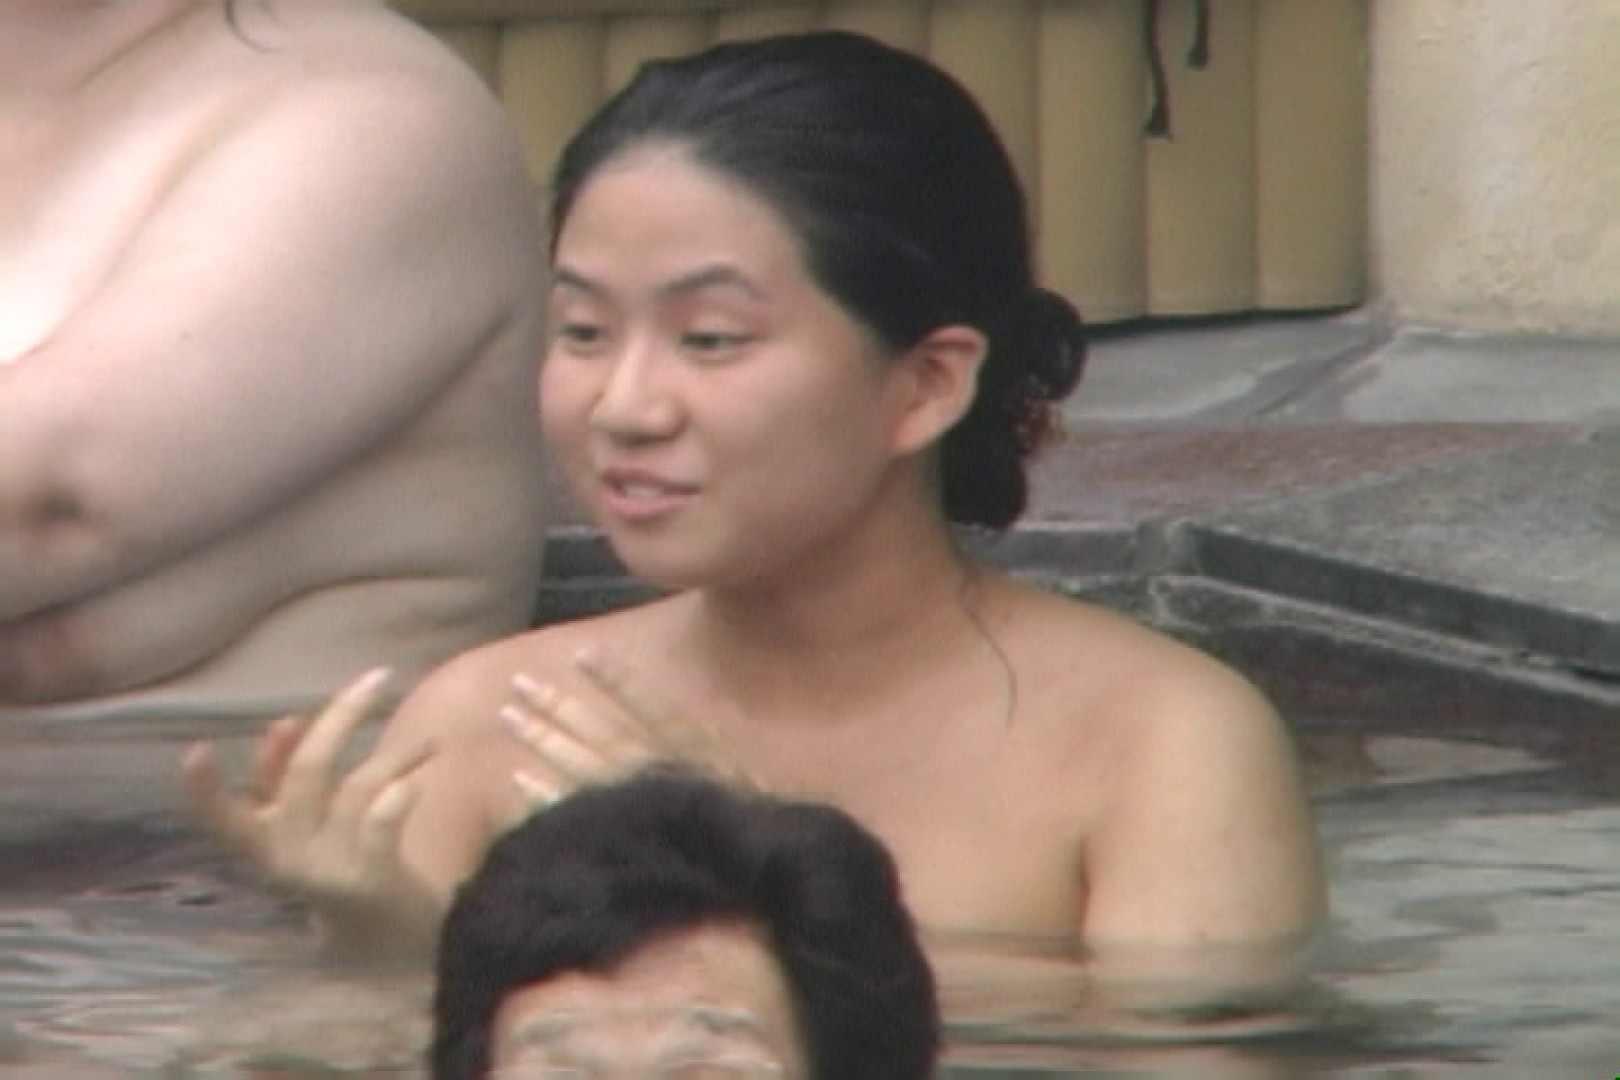 Aquaな露天風呂Vol.43【VIP限定】 OLのプライベート  11pic 3